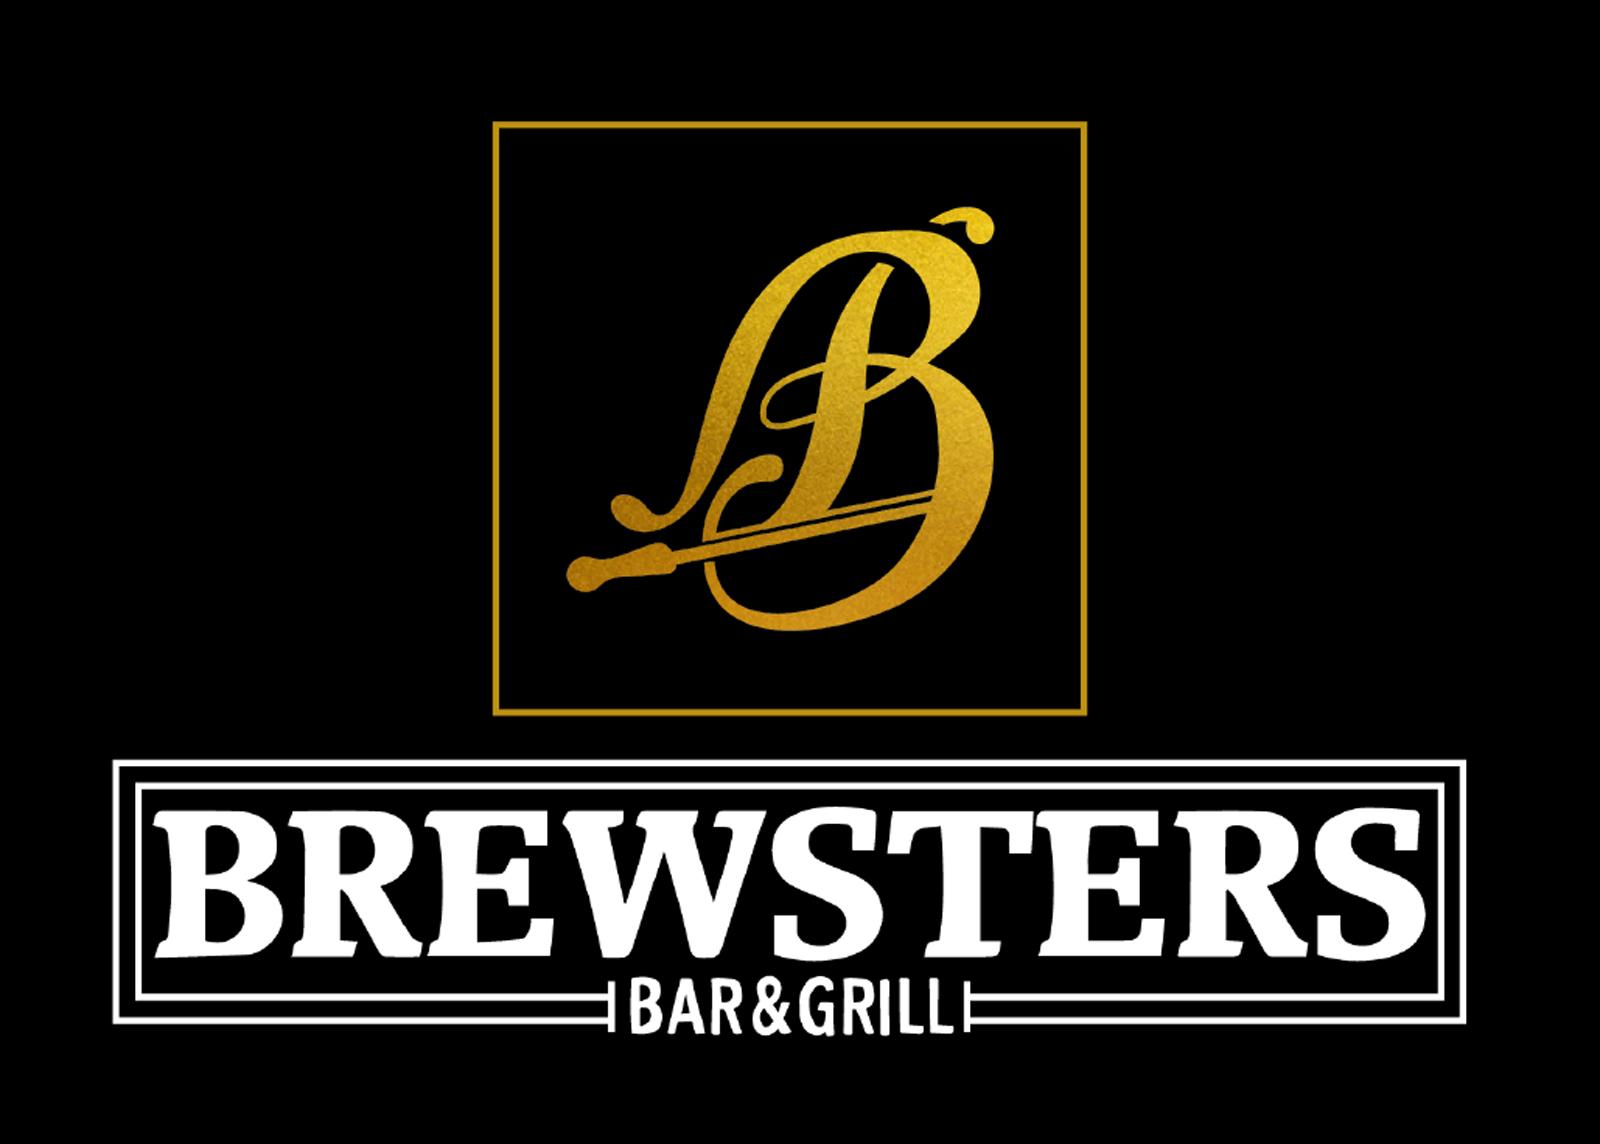 Brewsters Bar & Grill